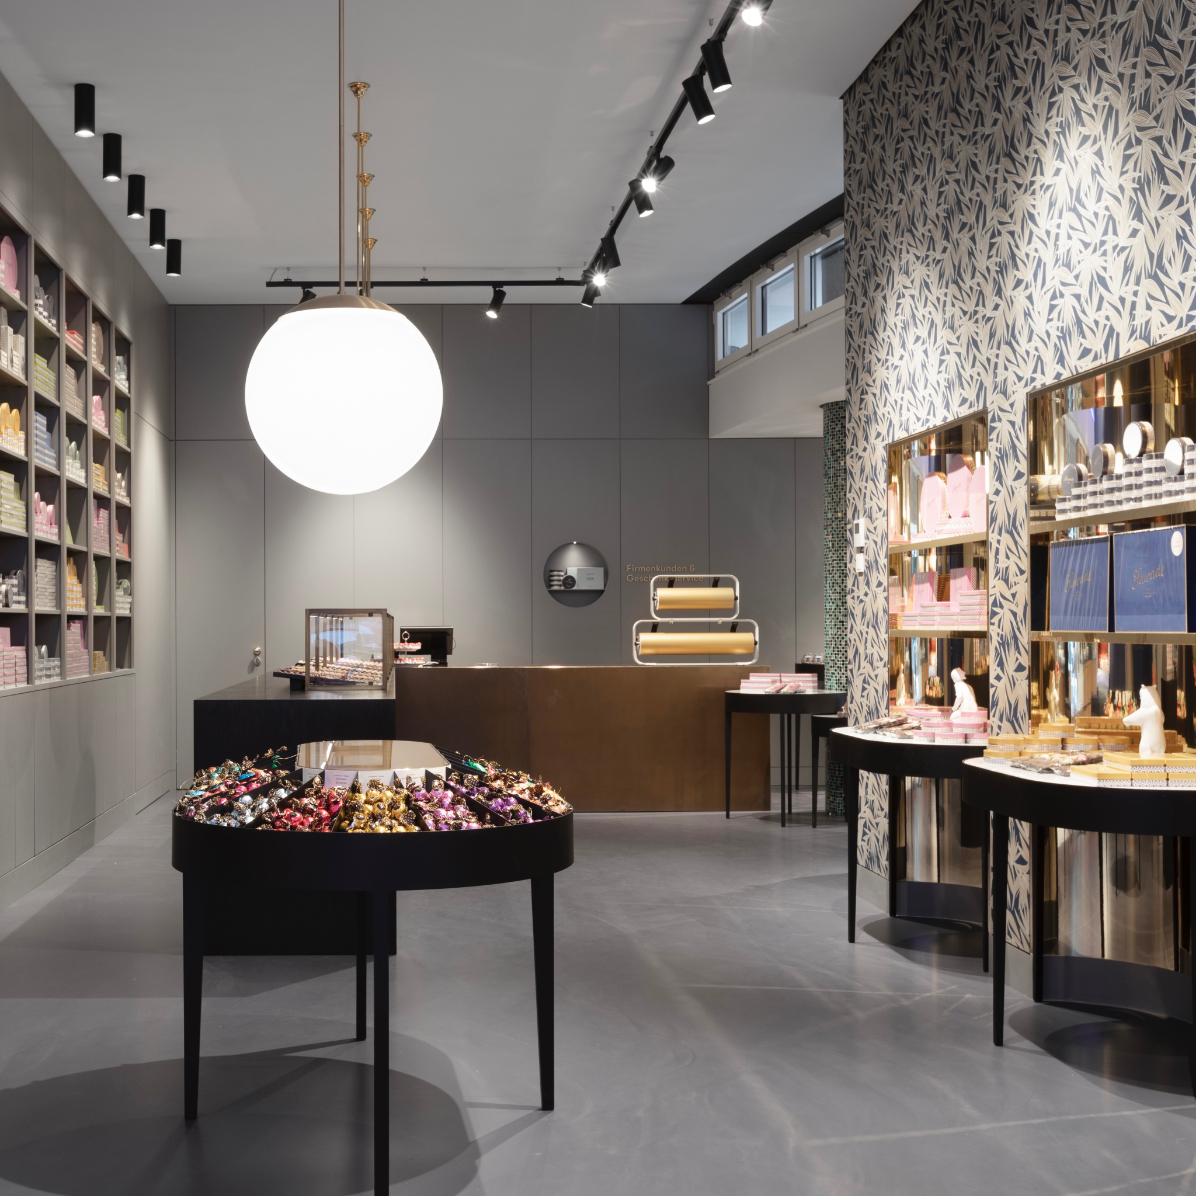 Sawade Shop Kurfuerstendamm  I Foto Jordana Schramm  (2)